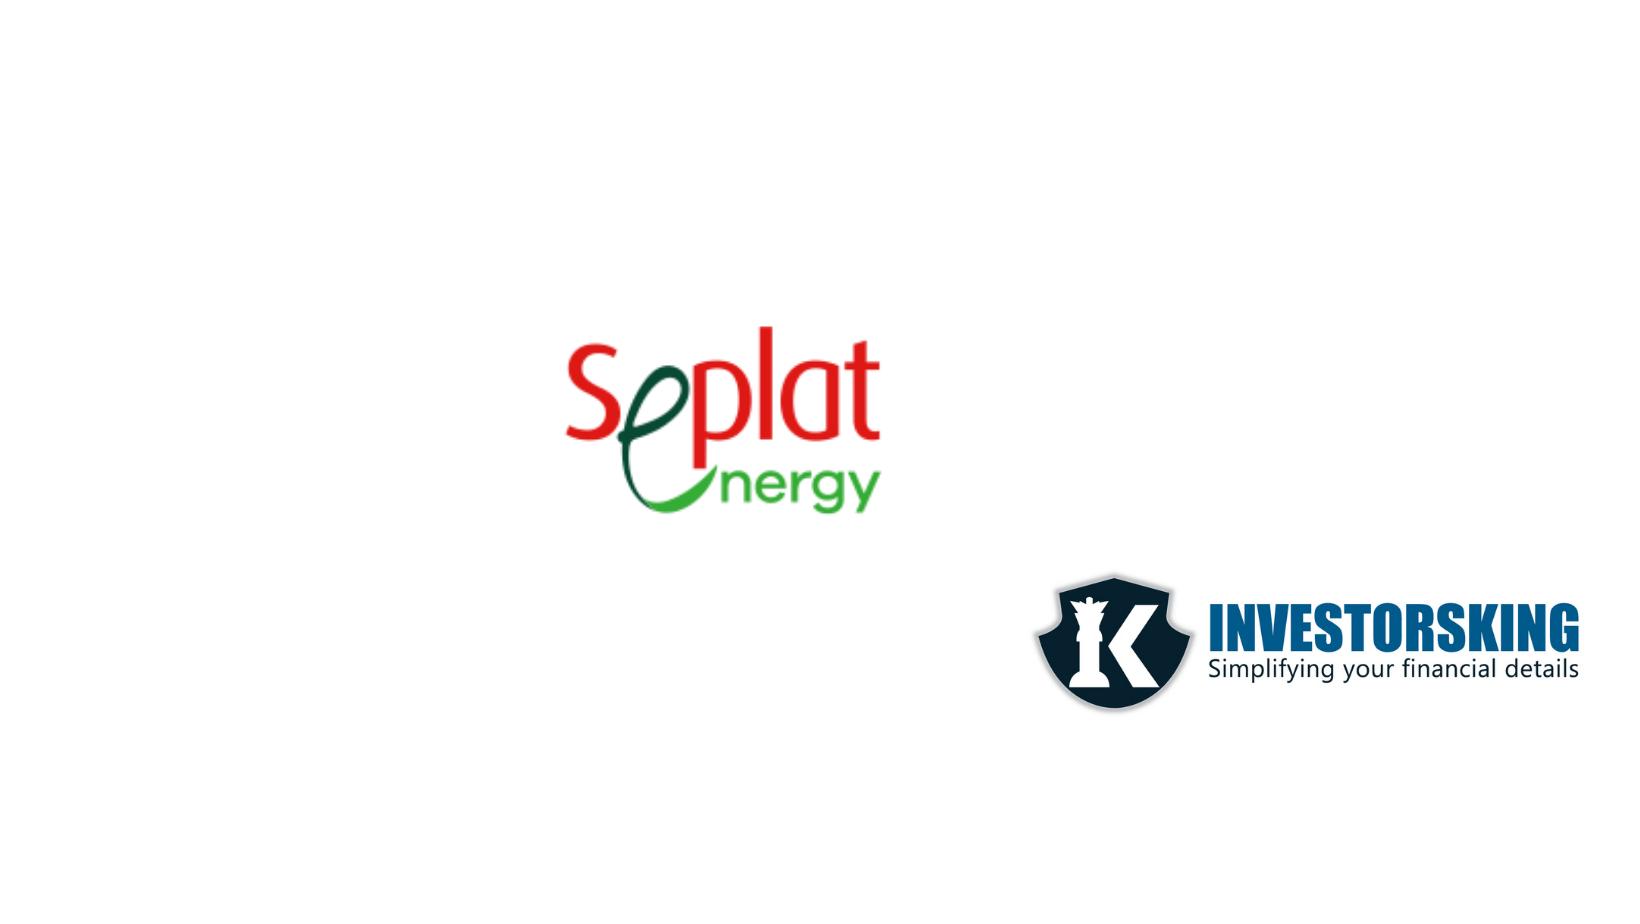 Seplat Energy Plc - Investors King